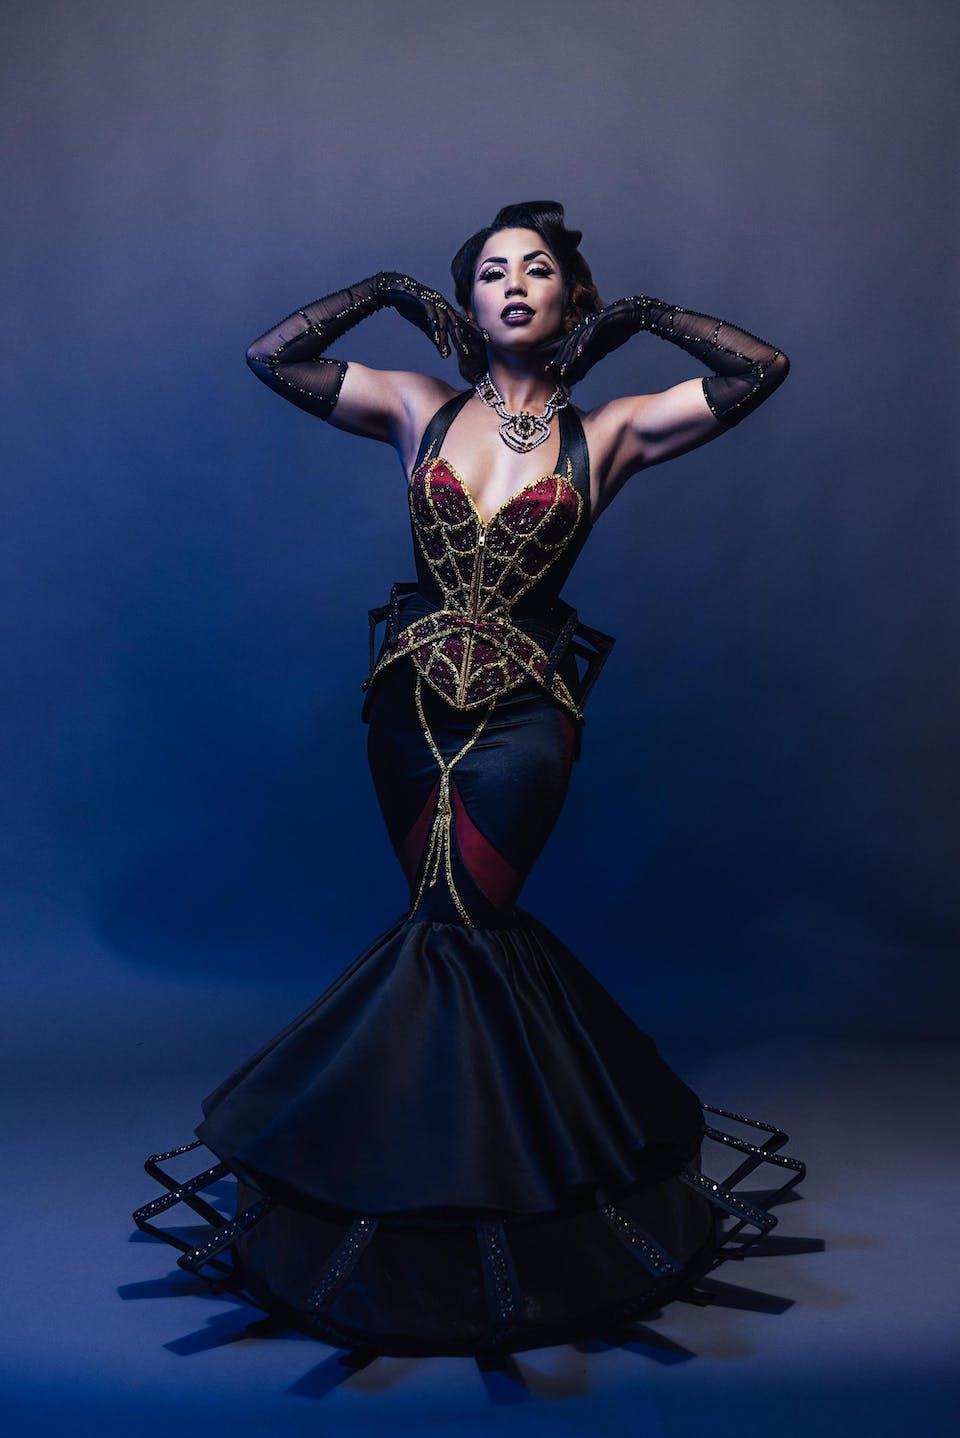 7th Annual Oklahoma City Burlesque Festival - Friday Showcase